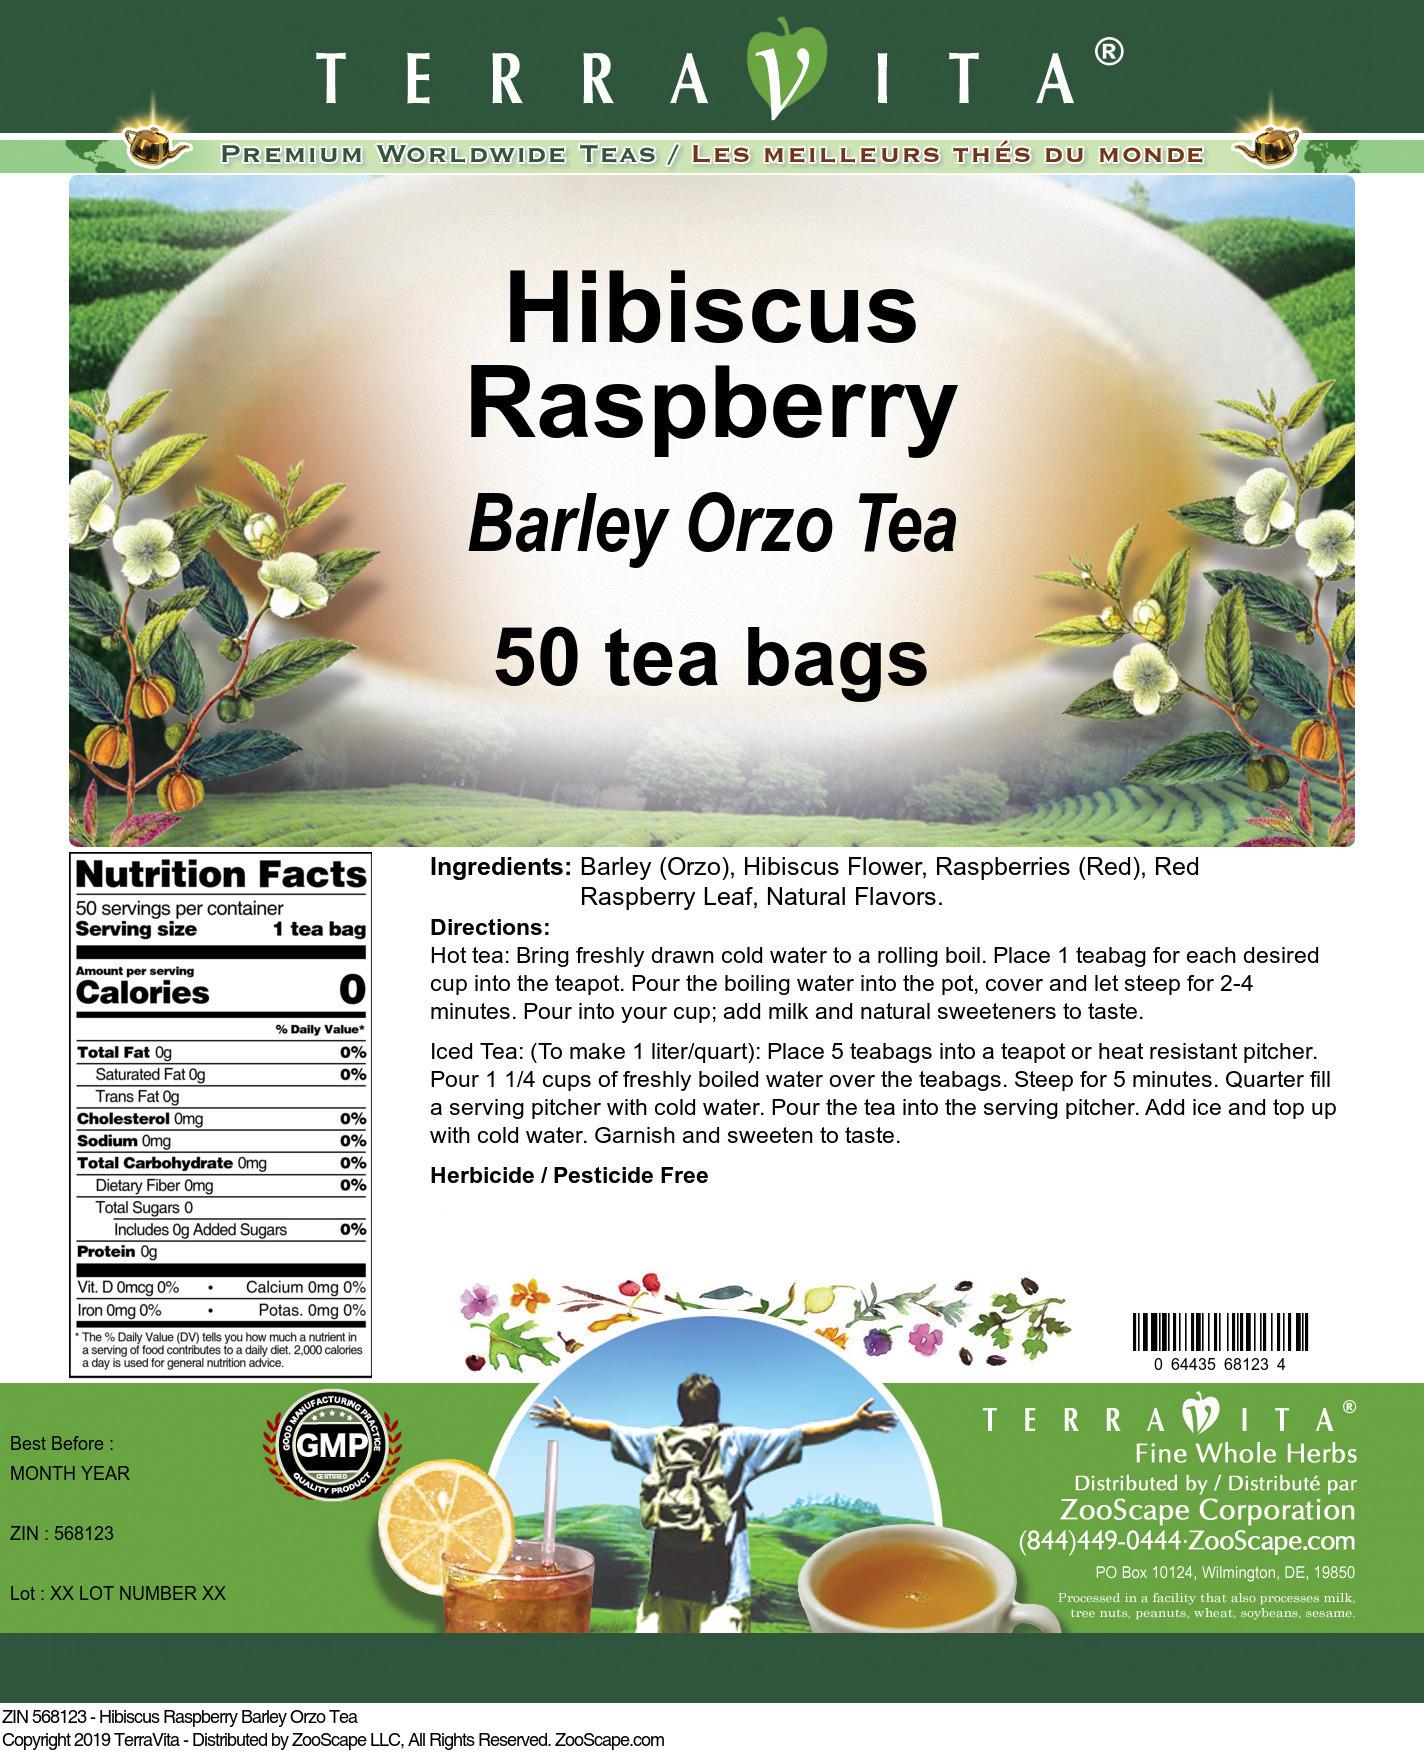 Hibiscus Raspberry Barley Orzo Tea